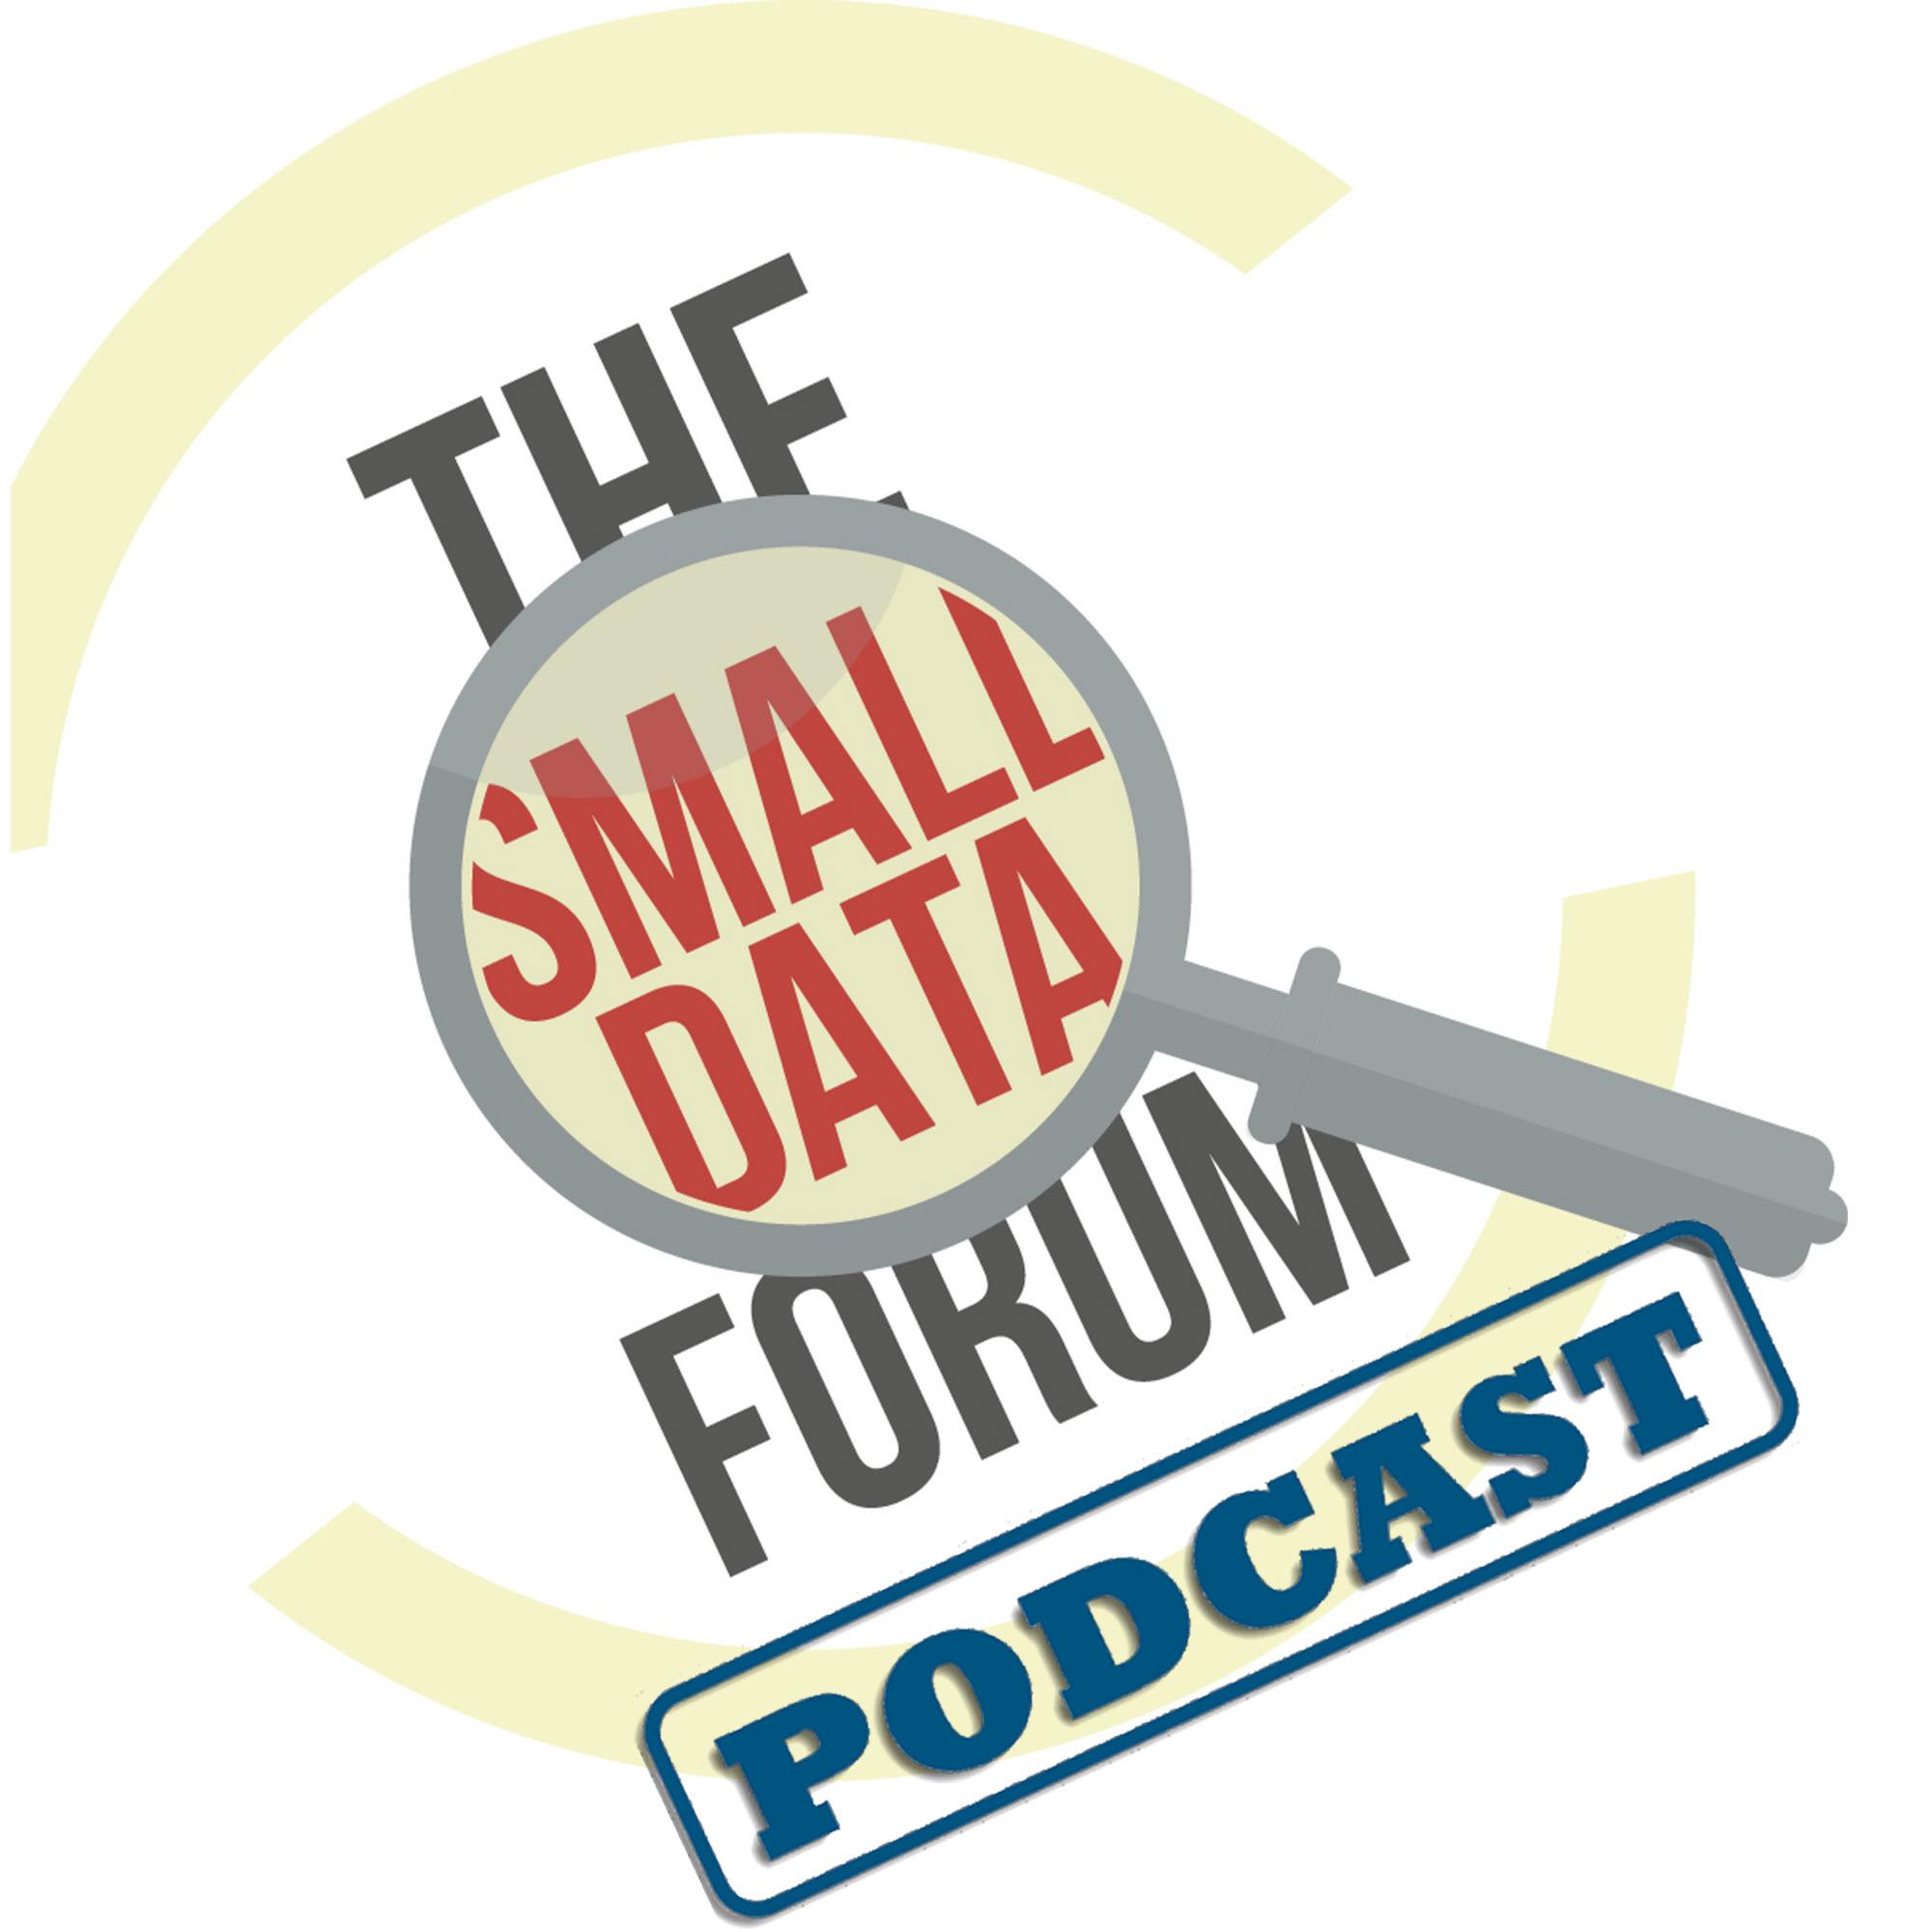 Small Data Forum Podcast show art